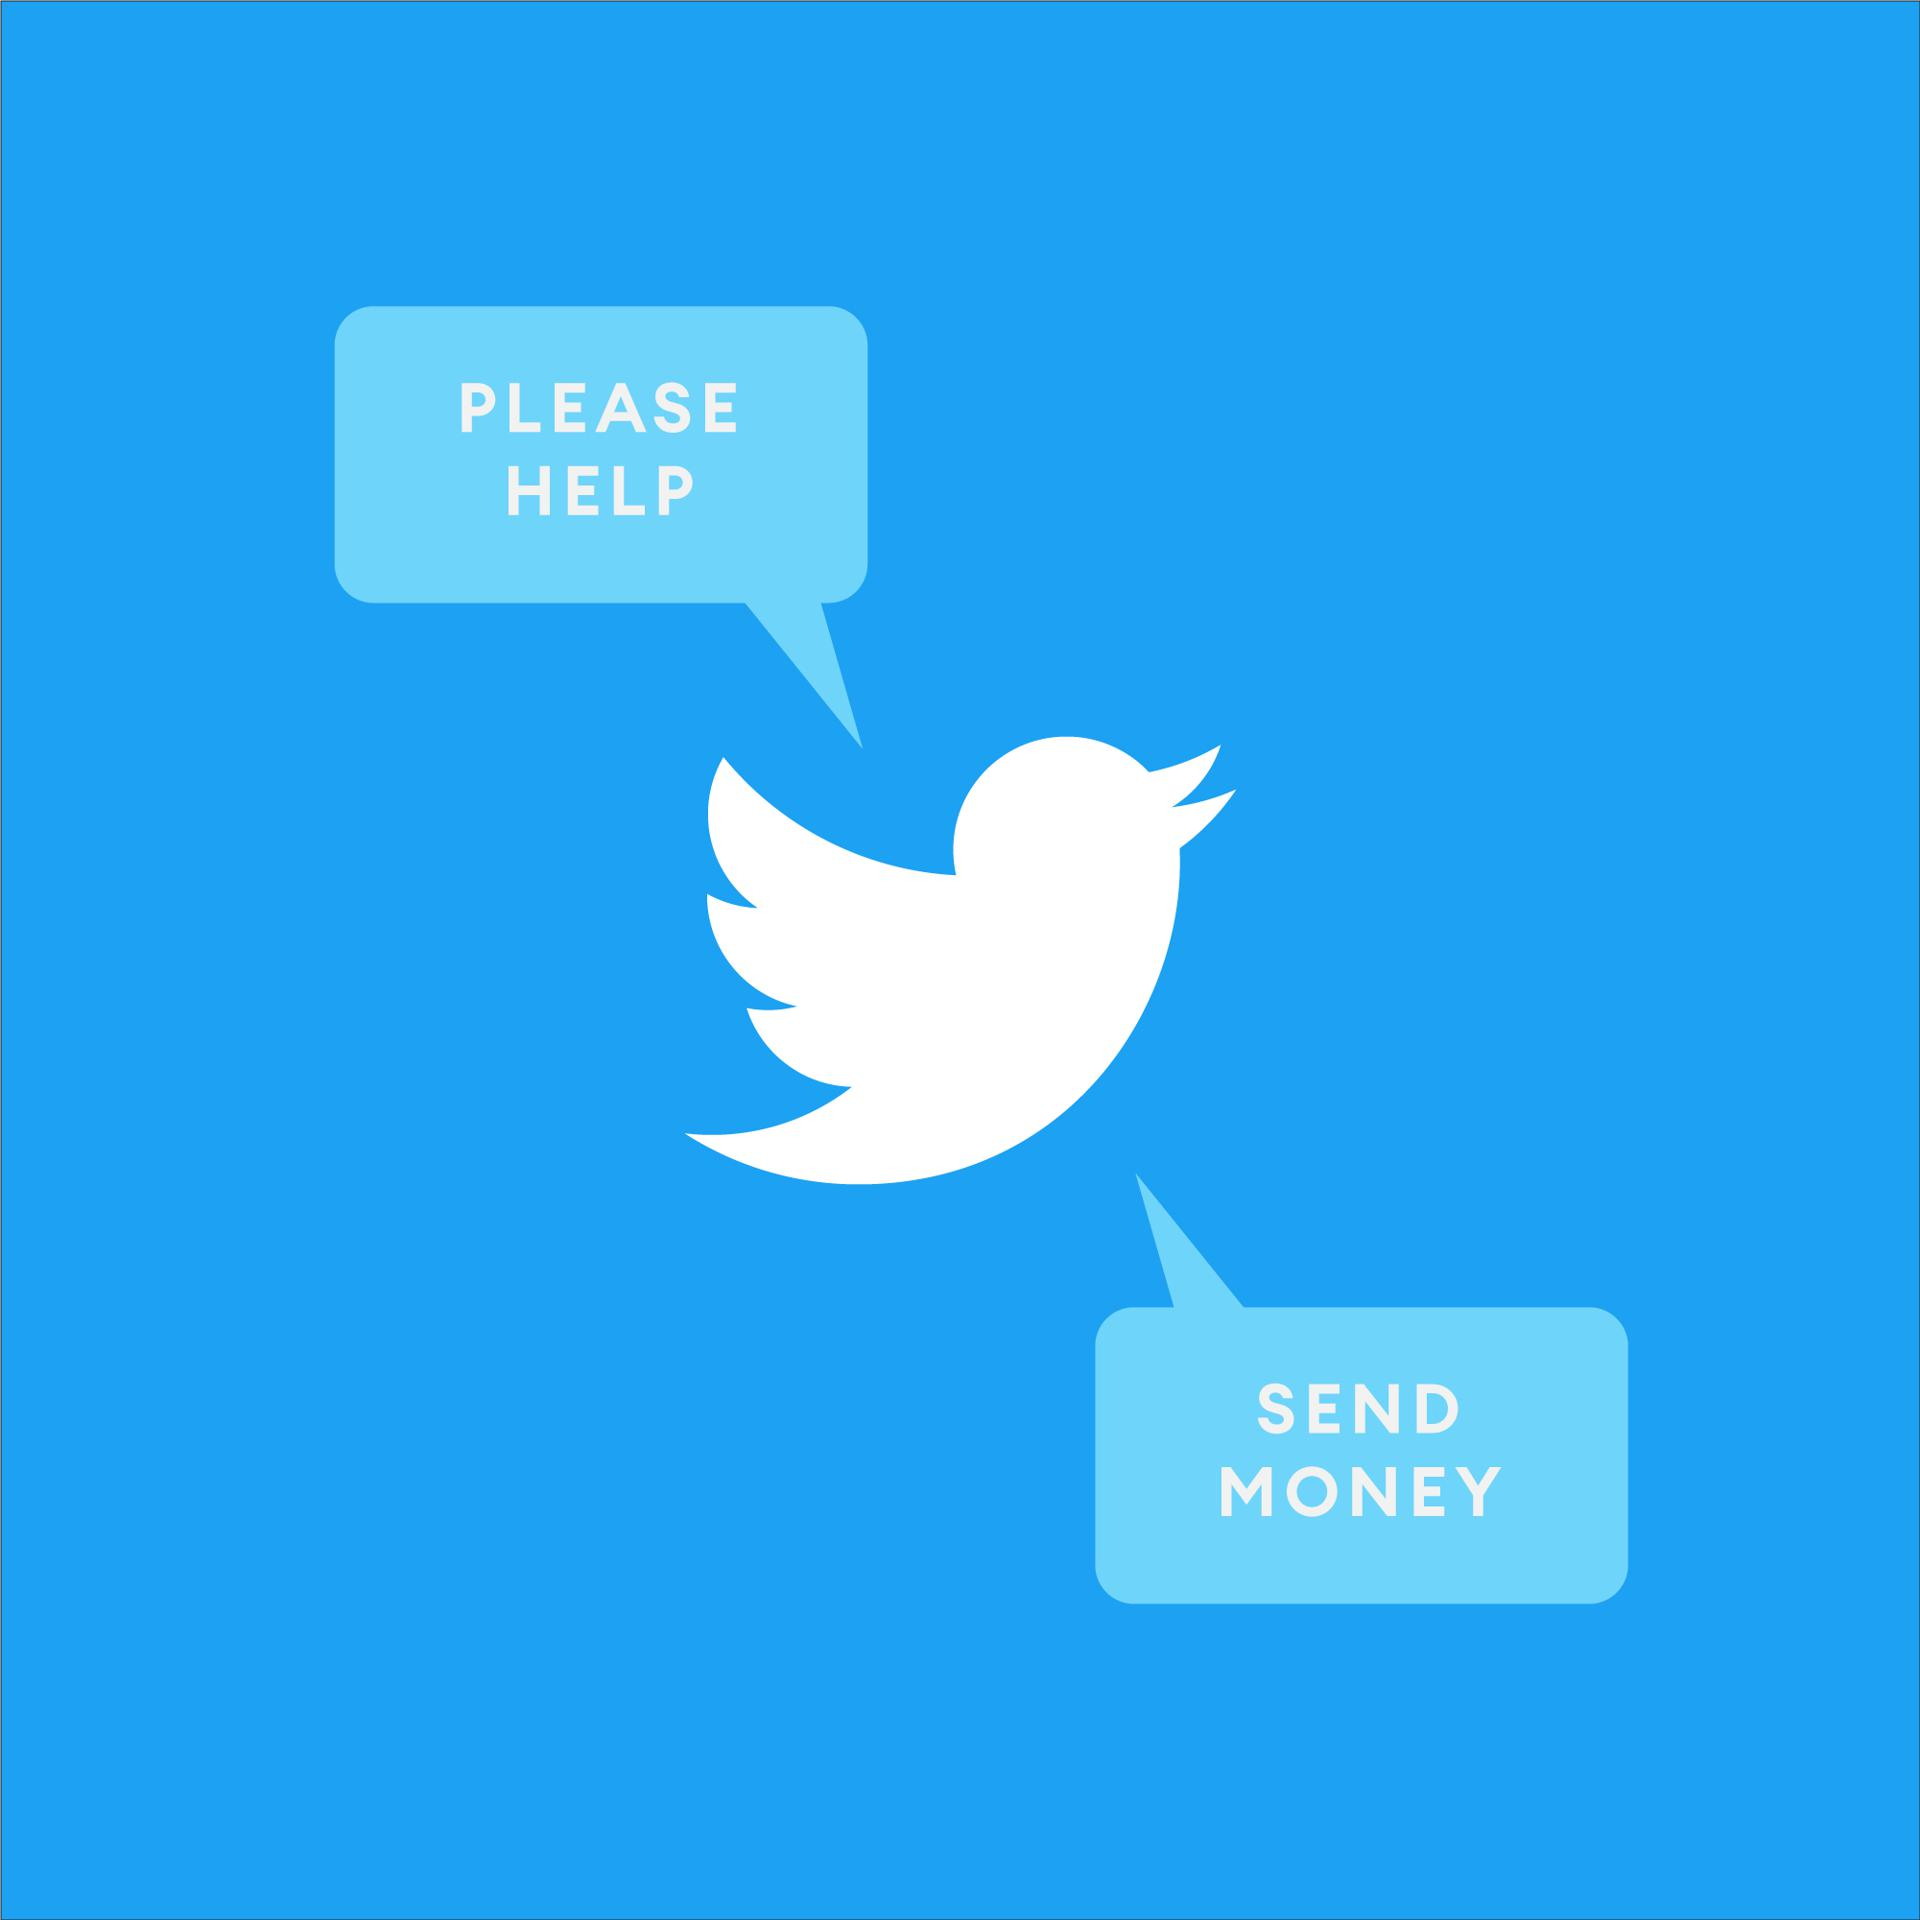 hero-twitter-money-please